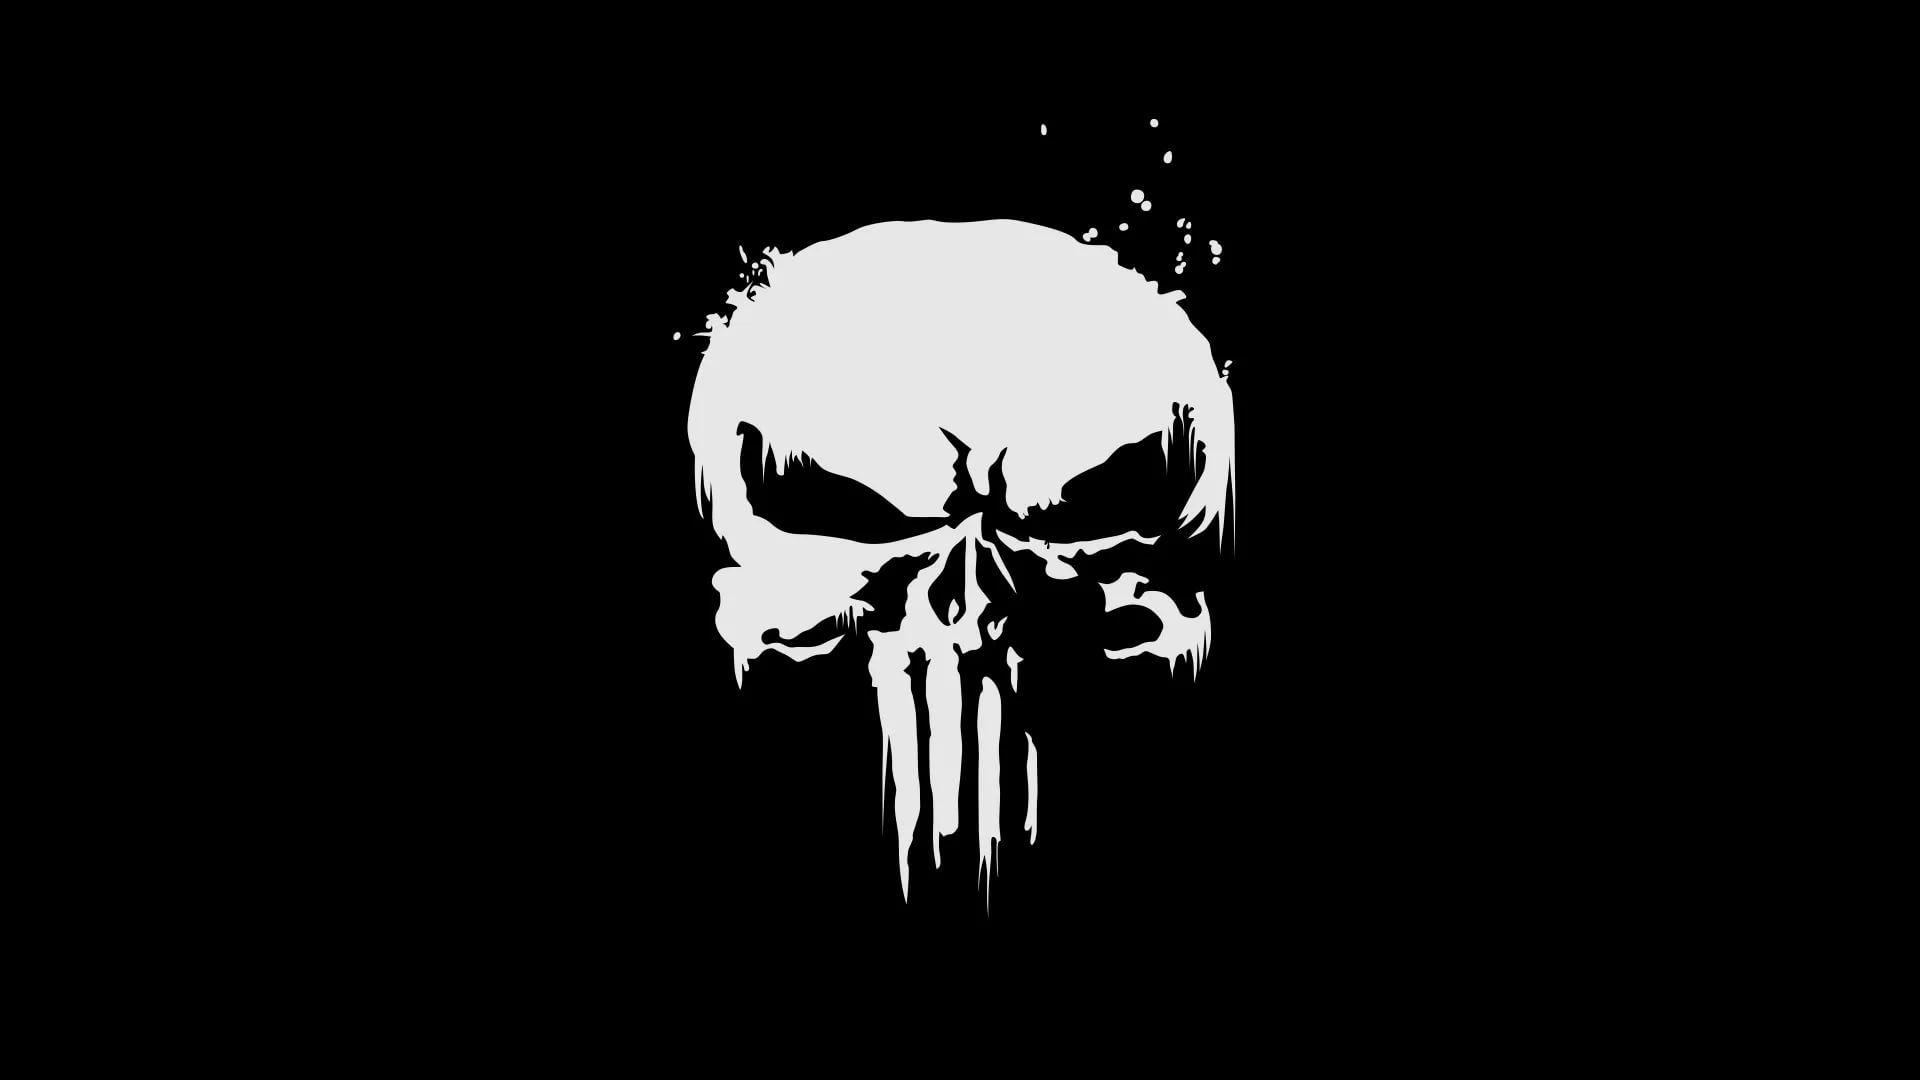 Punisher Skull download wallpaper image